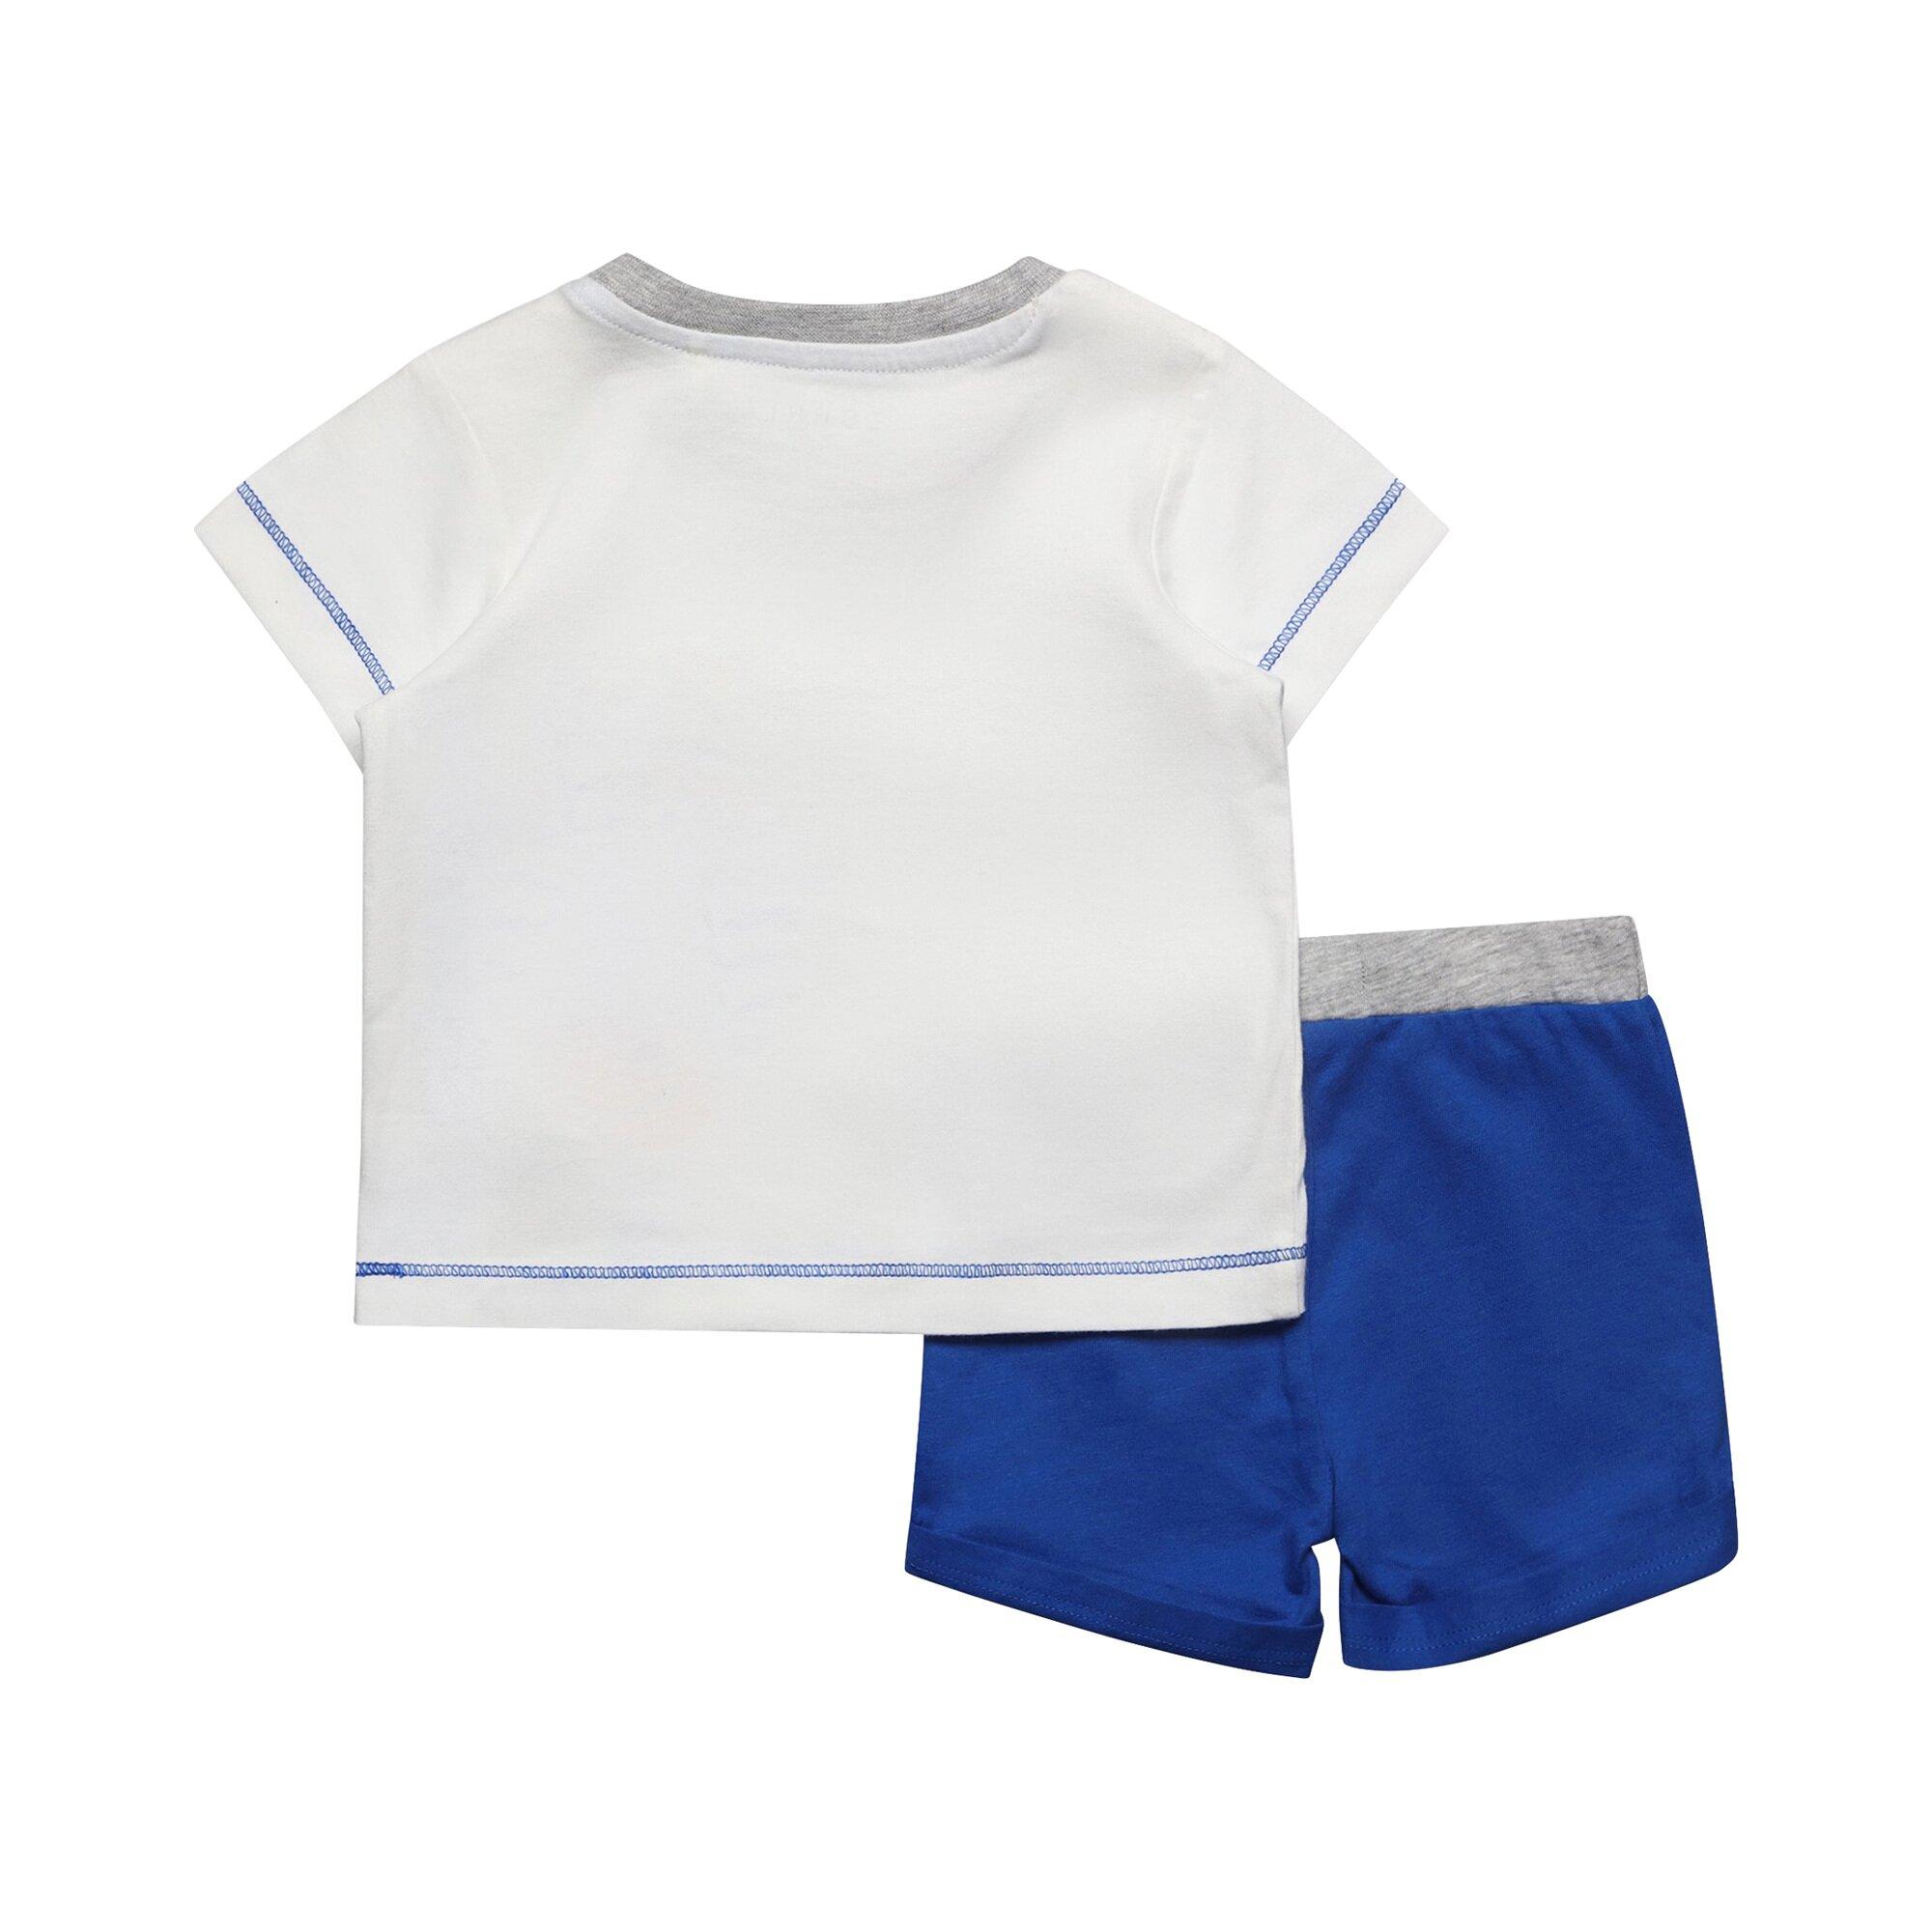 2-tlg-set-t-shirt-und-bermuda-affe